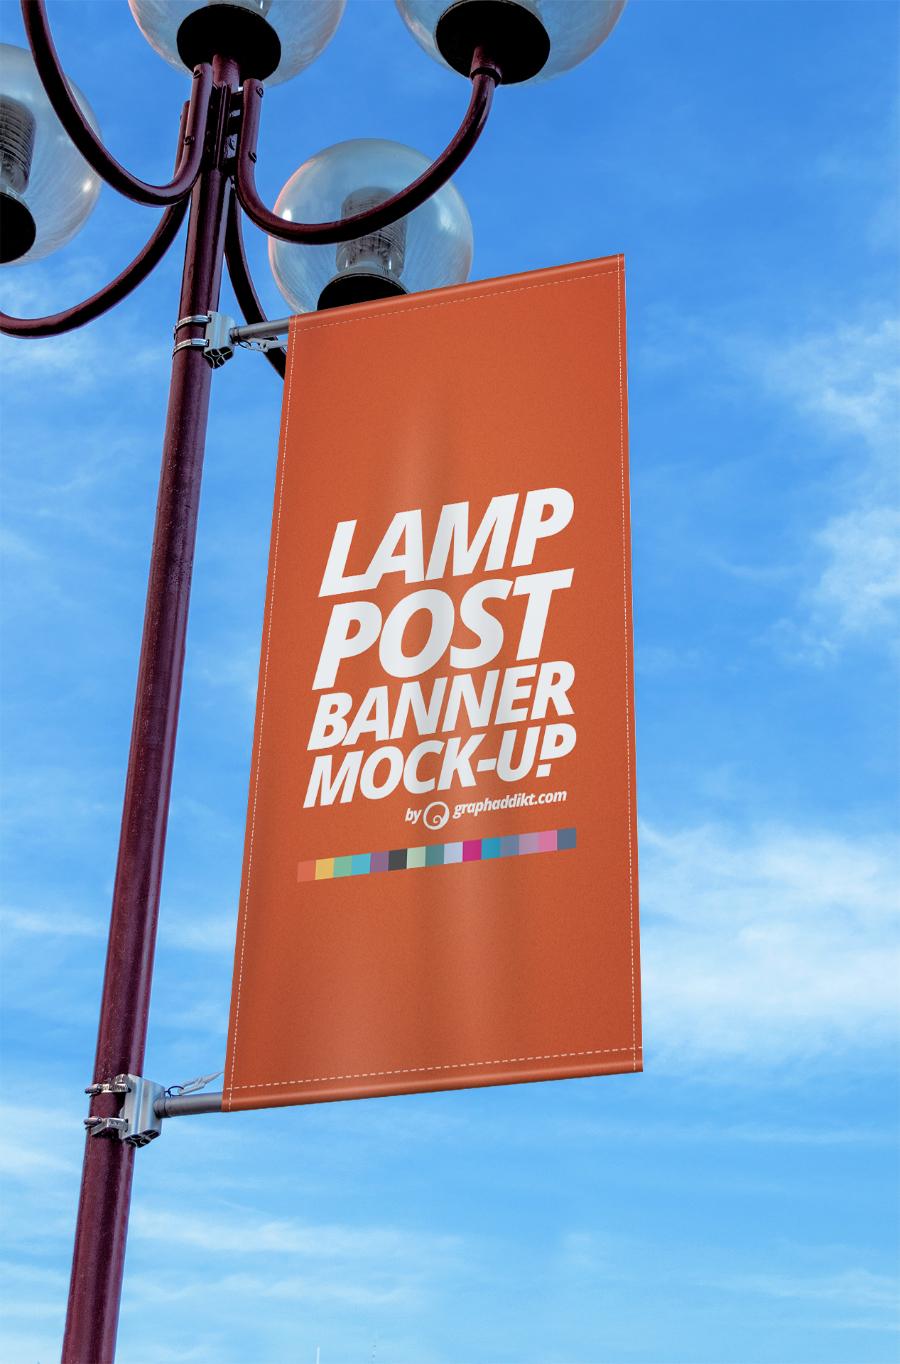 Free Lamp Post Banner Mockup  Free Design Resources